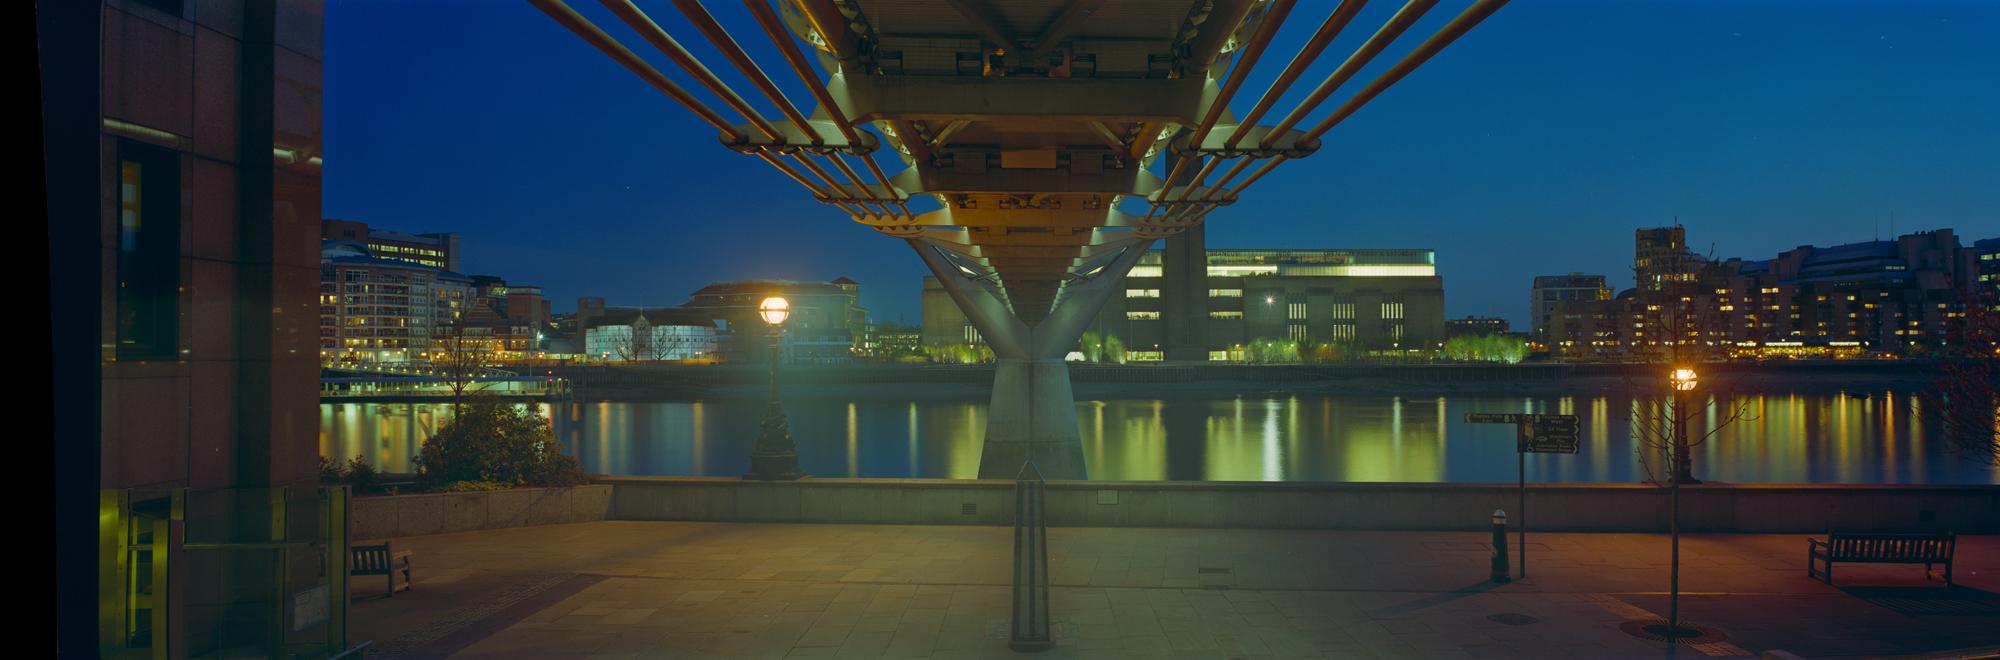 large format photography, Grossformatfotografie, Grossformatphotographie, Fotografie, Photographie, photography, 6x17, city, Stadt, Architektur, architecture, Beton, Stahl, concrete, steel, Brücke, bridge, London